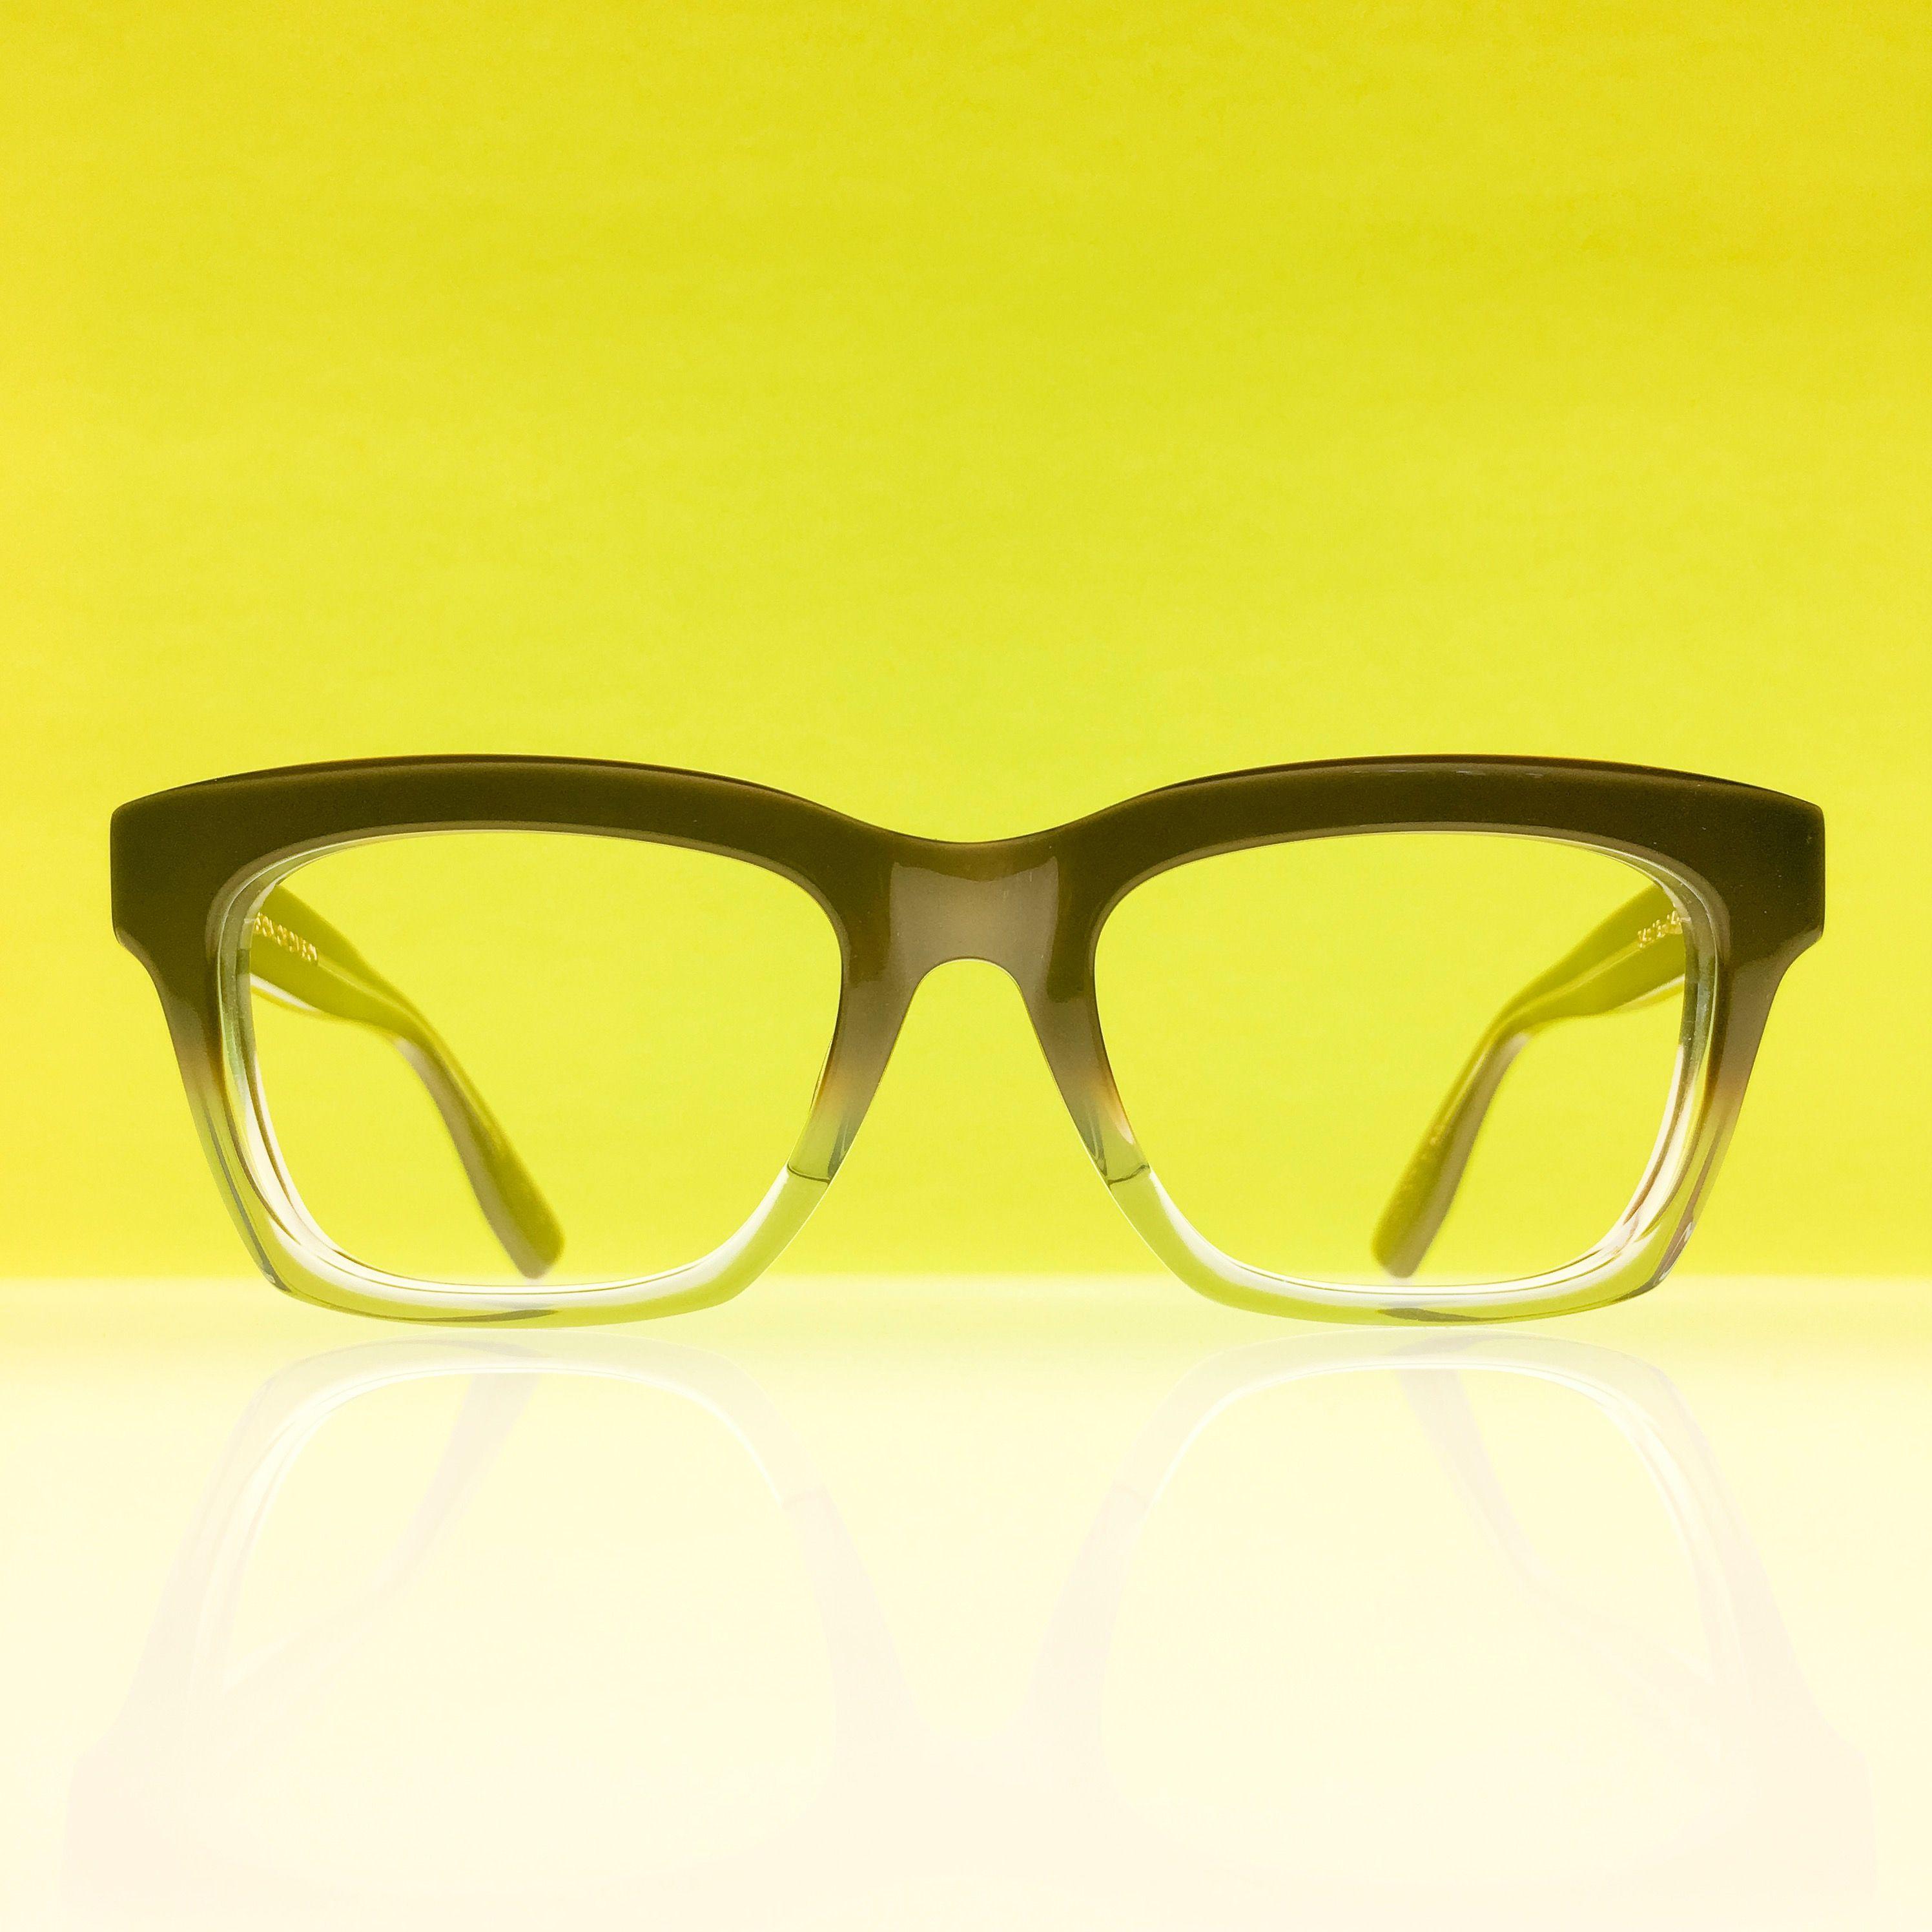 Kaneko Optical Dropping Serious Heat As Usual Model Vod 7 Is A Pearlescent Warm Grey It S Bulky Form Mediated By A G Eyewear Frames Luxury Eyewear Eyewear